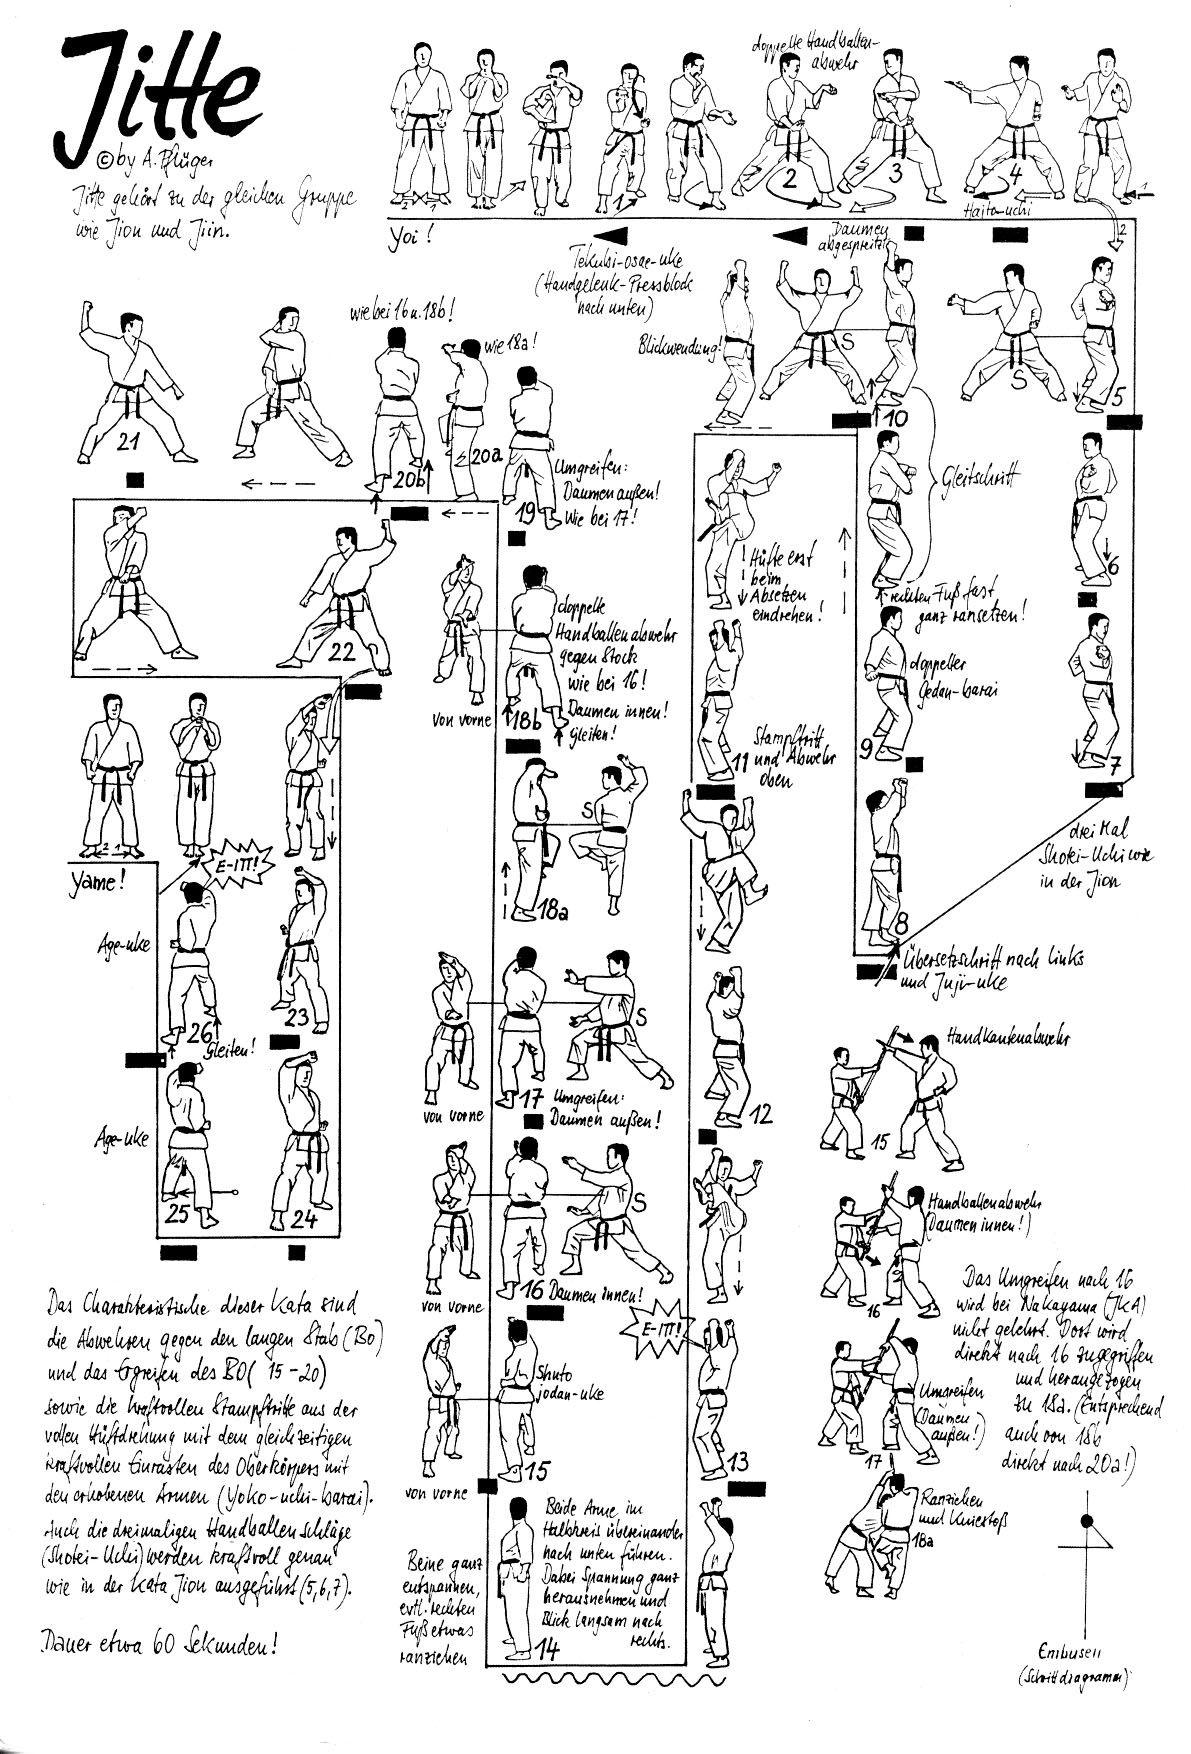 martial arts diagram renault megane wiring pdf jitte shotokan katas pinterest